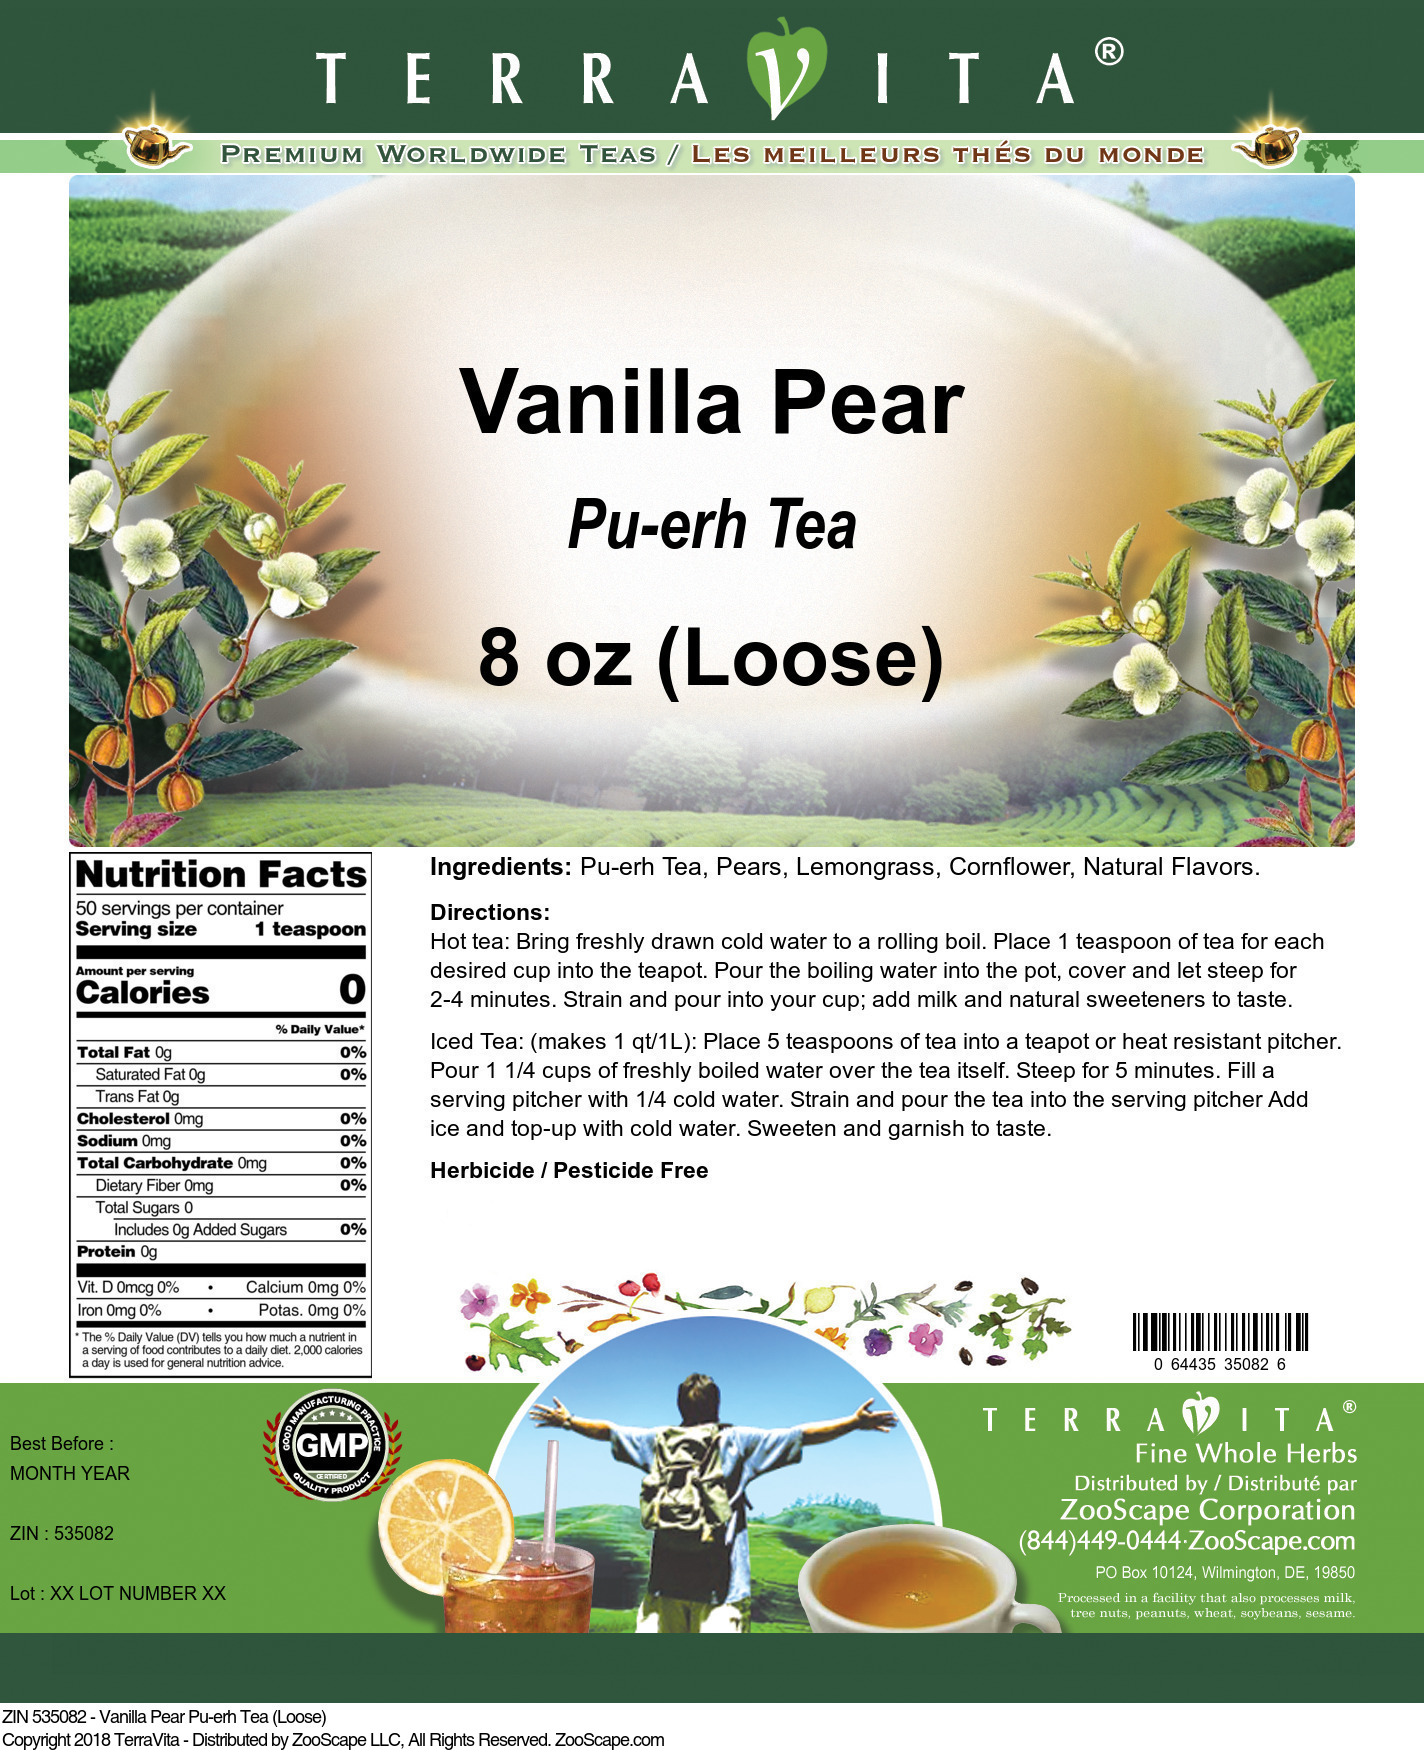 Vanilla Pear Pu-erh Tea (Loose)